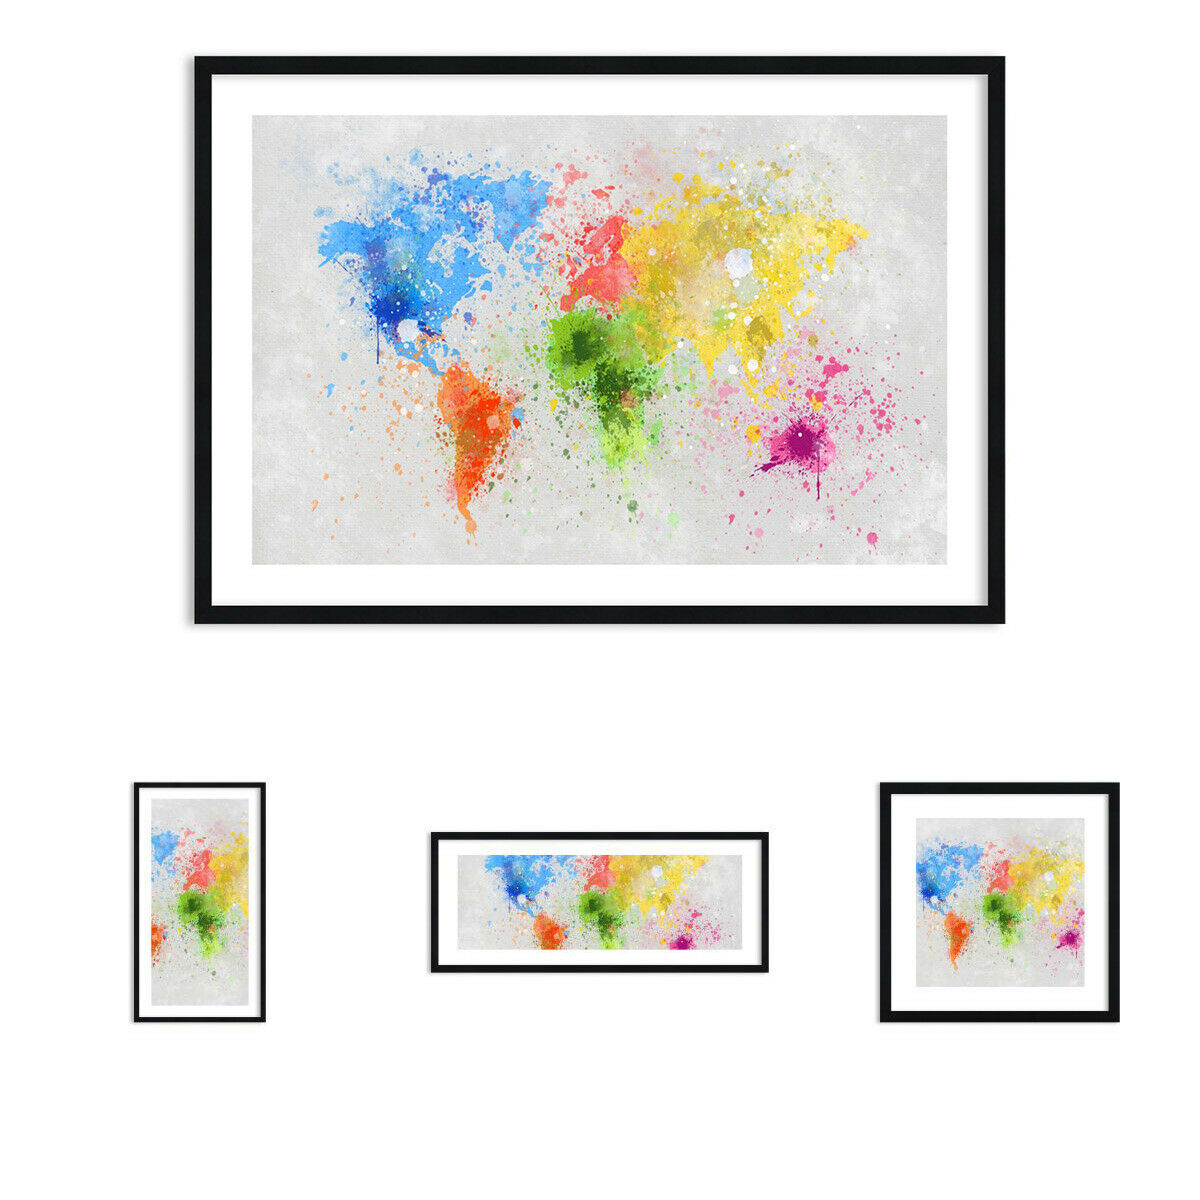 Bild im Rahmen - Karte Welt modern 3559 DE